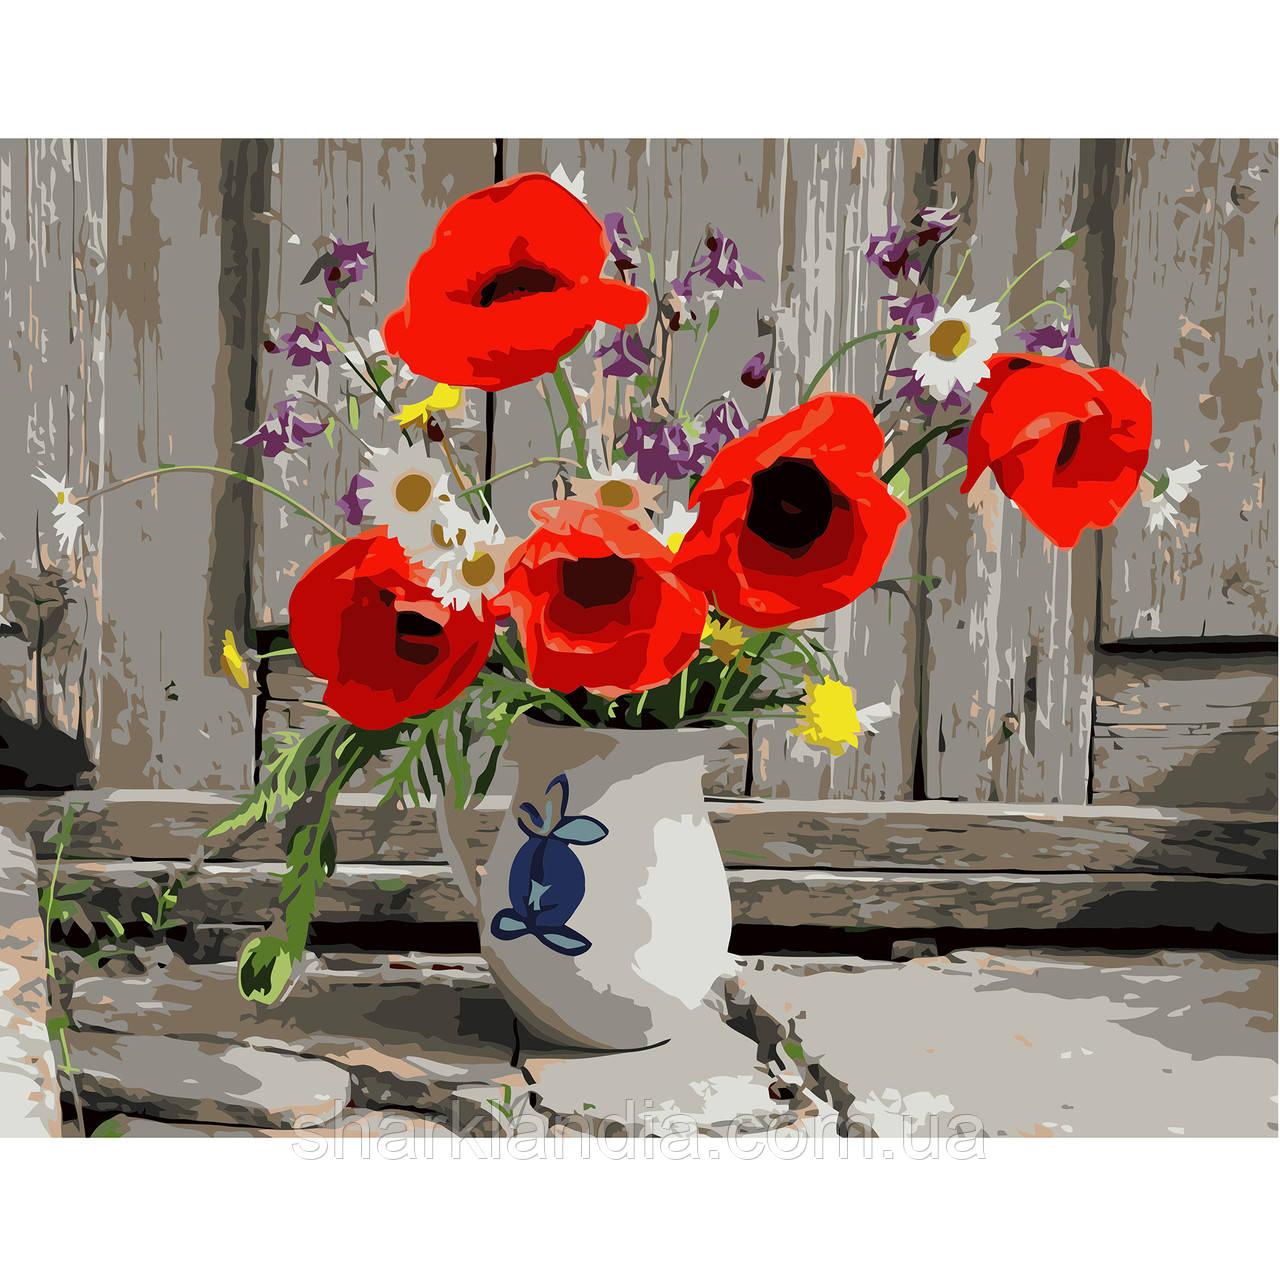 Картина по номерам Букет с домашнего сада 40х50см Strateg Цветы Раскраска по цифрам